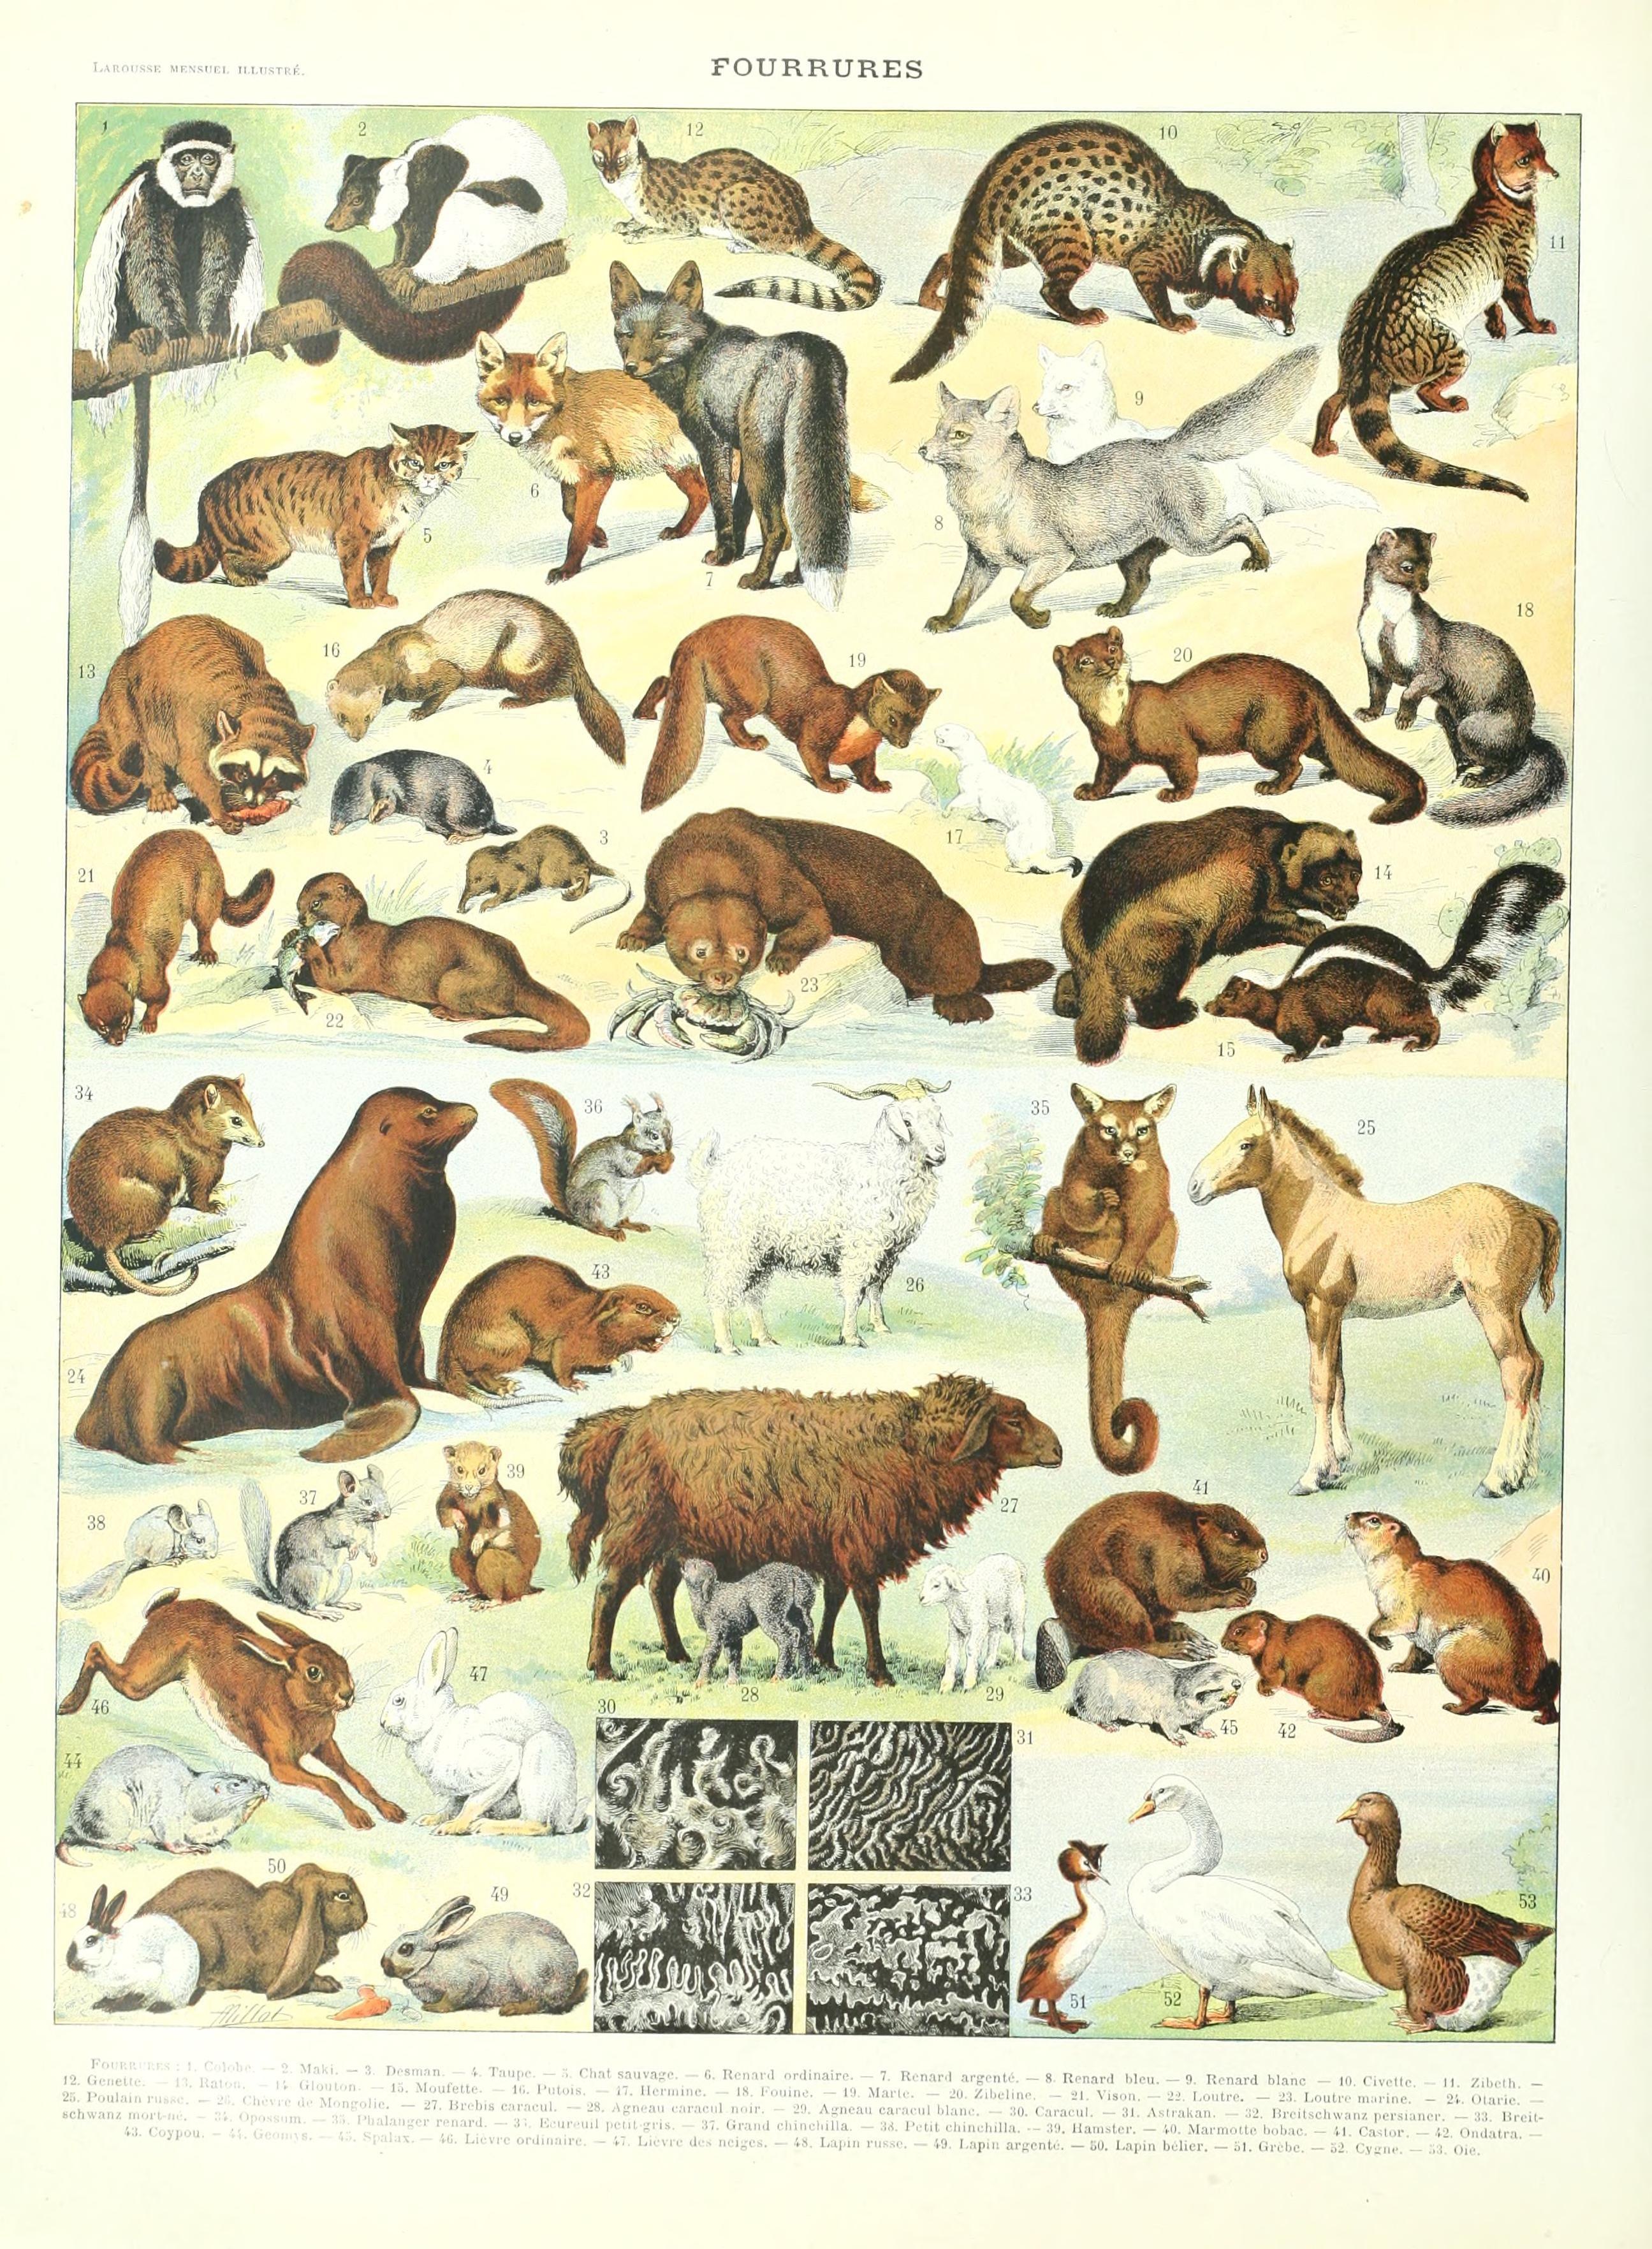 Larousse Mensuel Illustre 1907 1920 Planche Fourrures Art